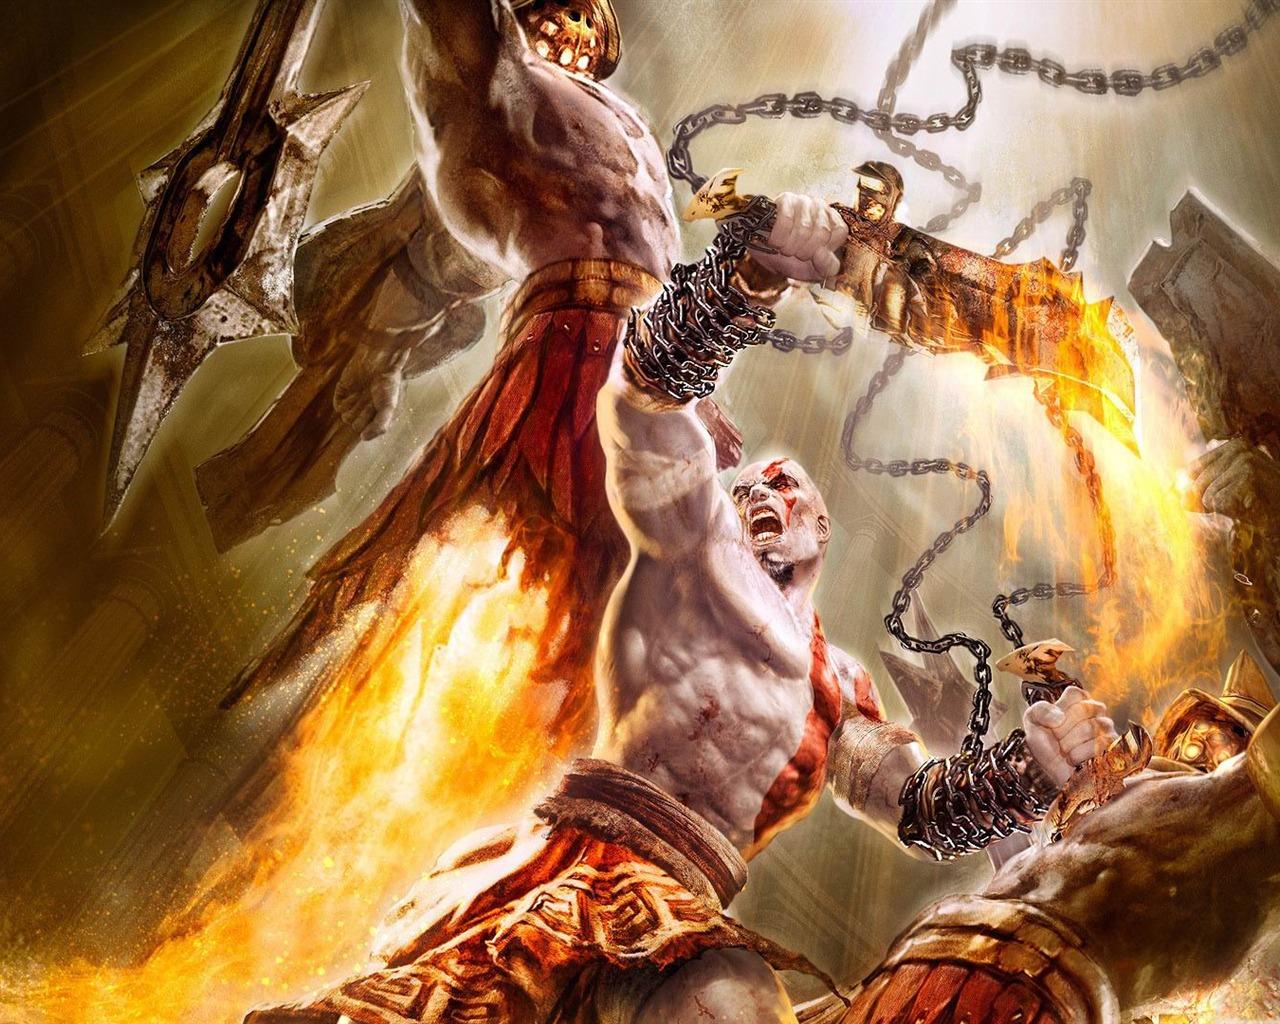 god of war战神高清游戏壁纸 - 1280x1024 壁纸 下载图片